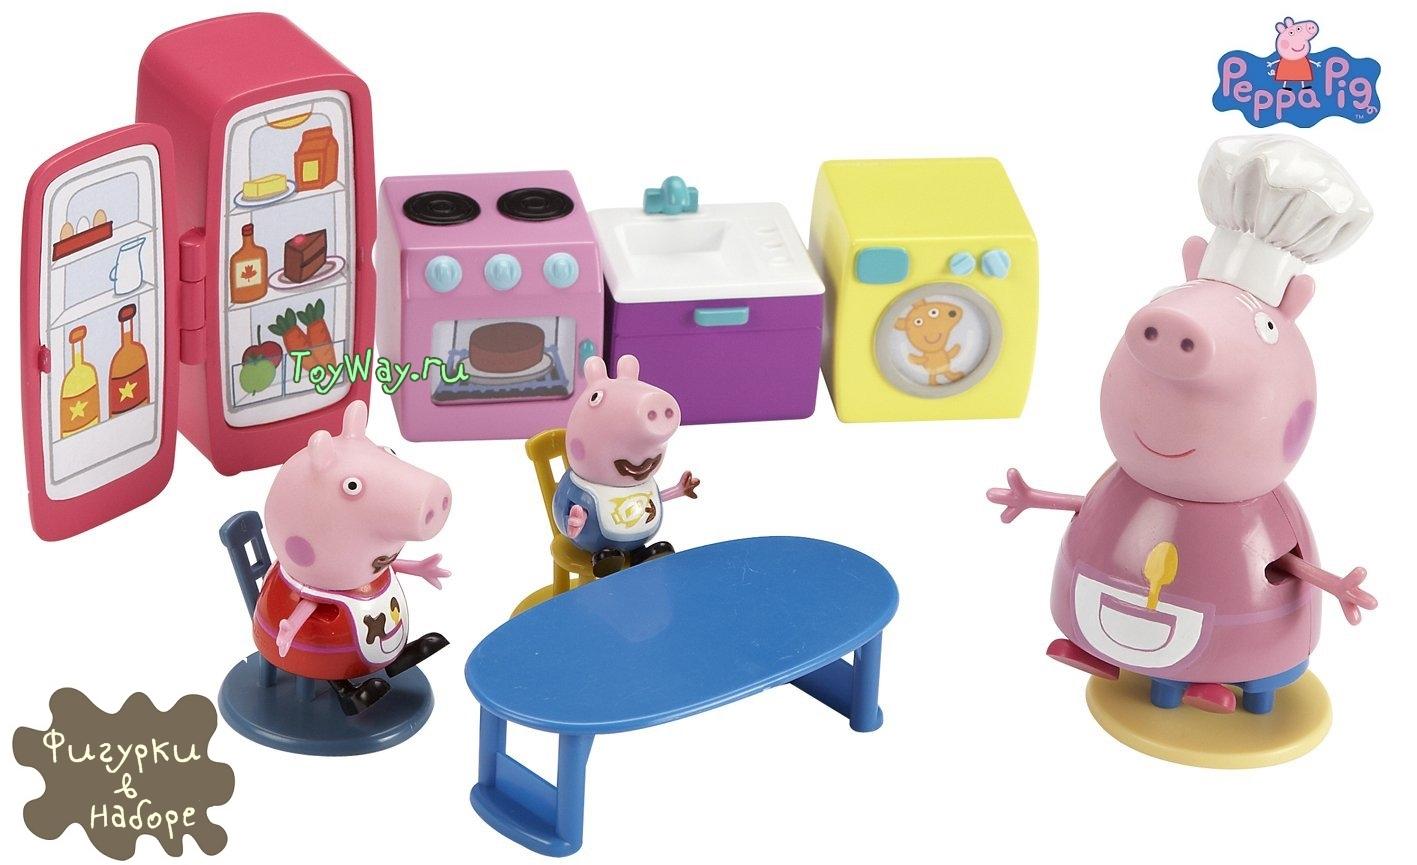 Peppa Pig. Кухня Пеппы + Бабушка, Пеппа и ДжорджДетские игровые кухни<br>Peppa Pig. Кухня Пеппы + Бабушка, Пеппа и Джордж<br>